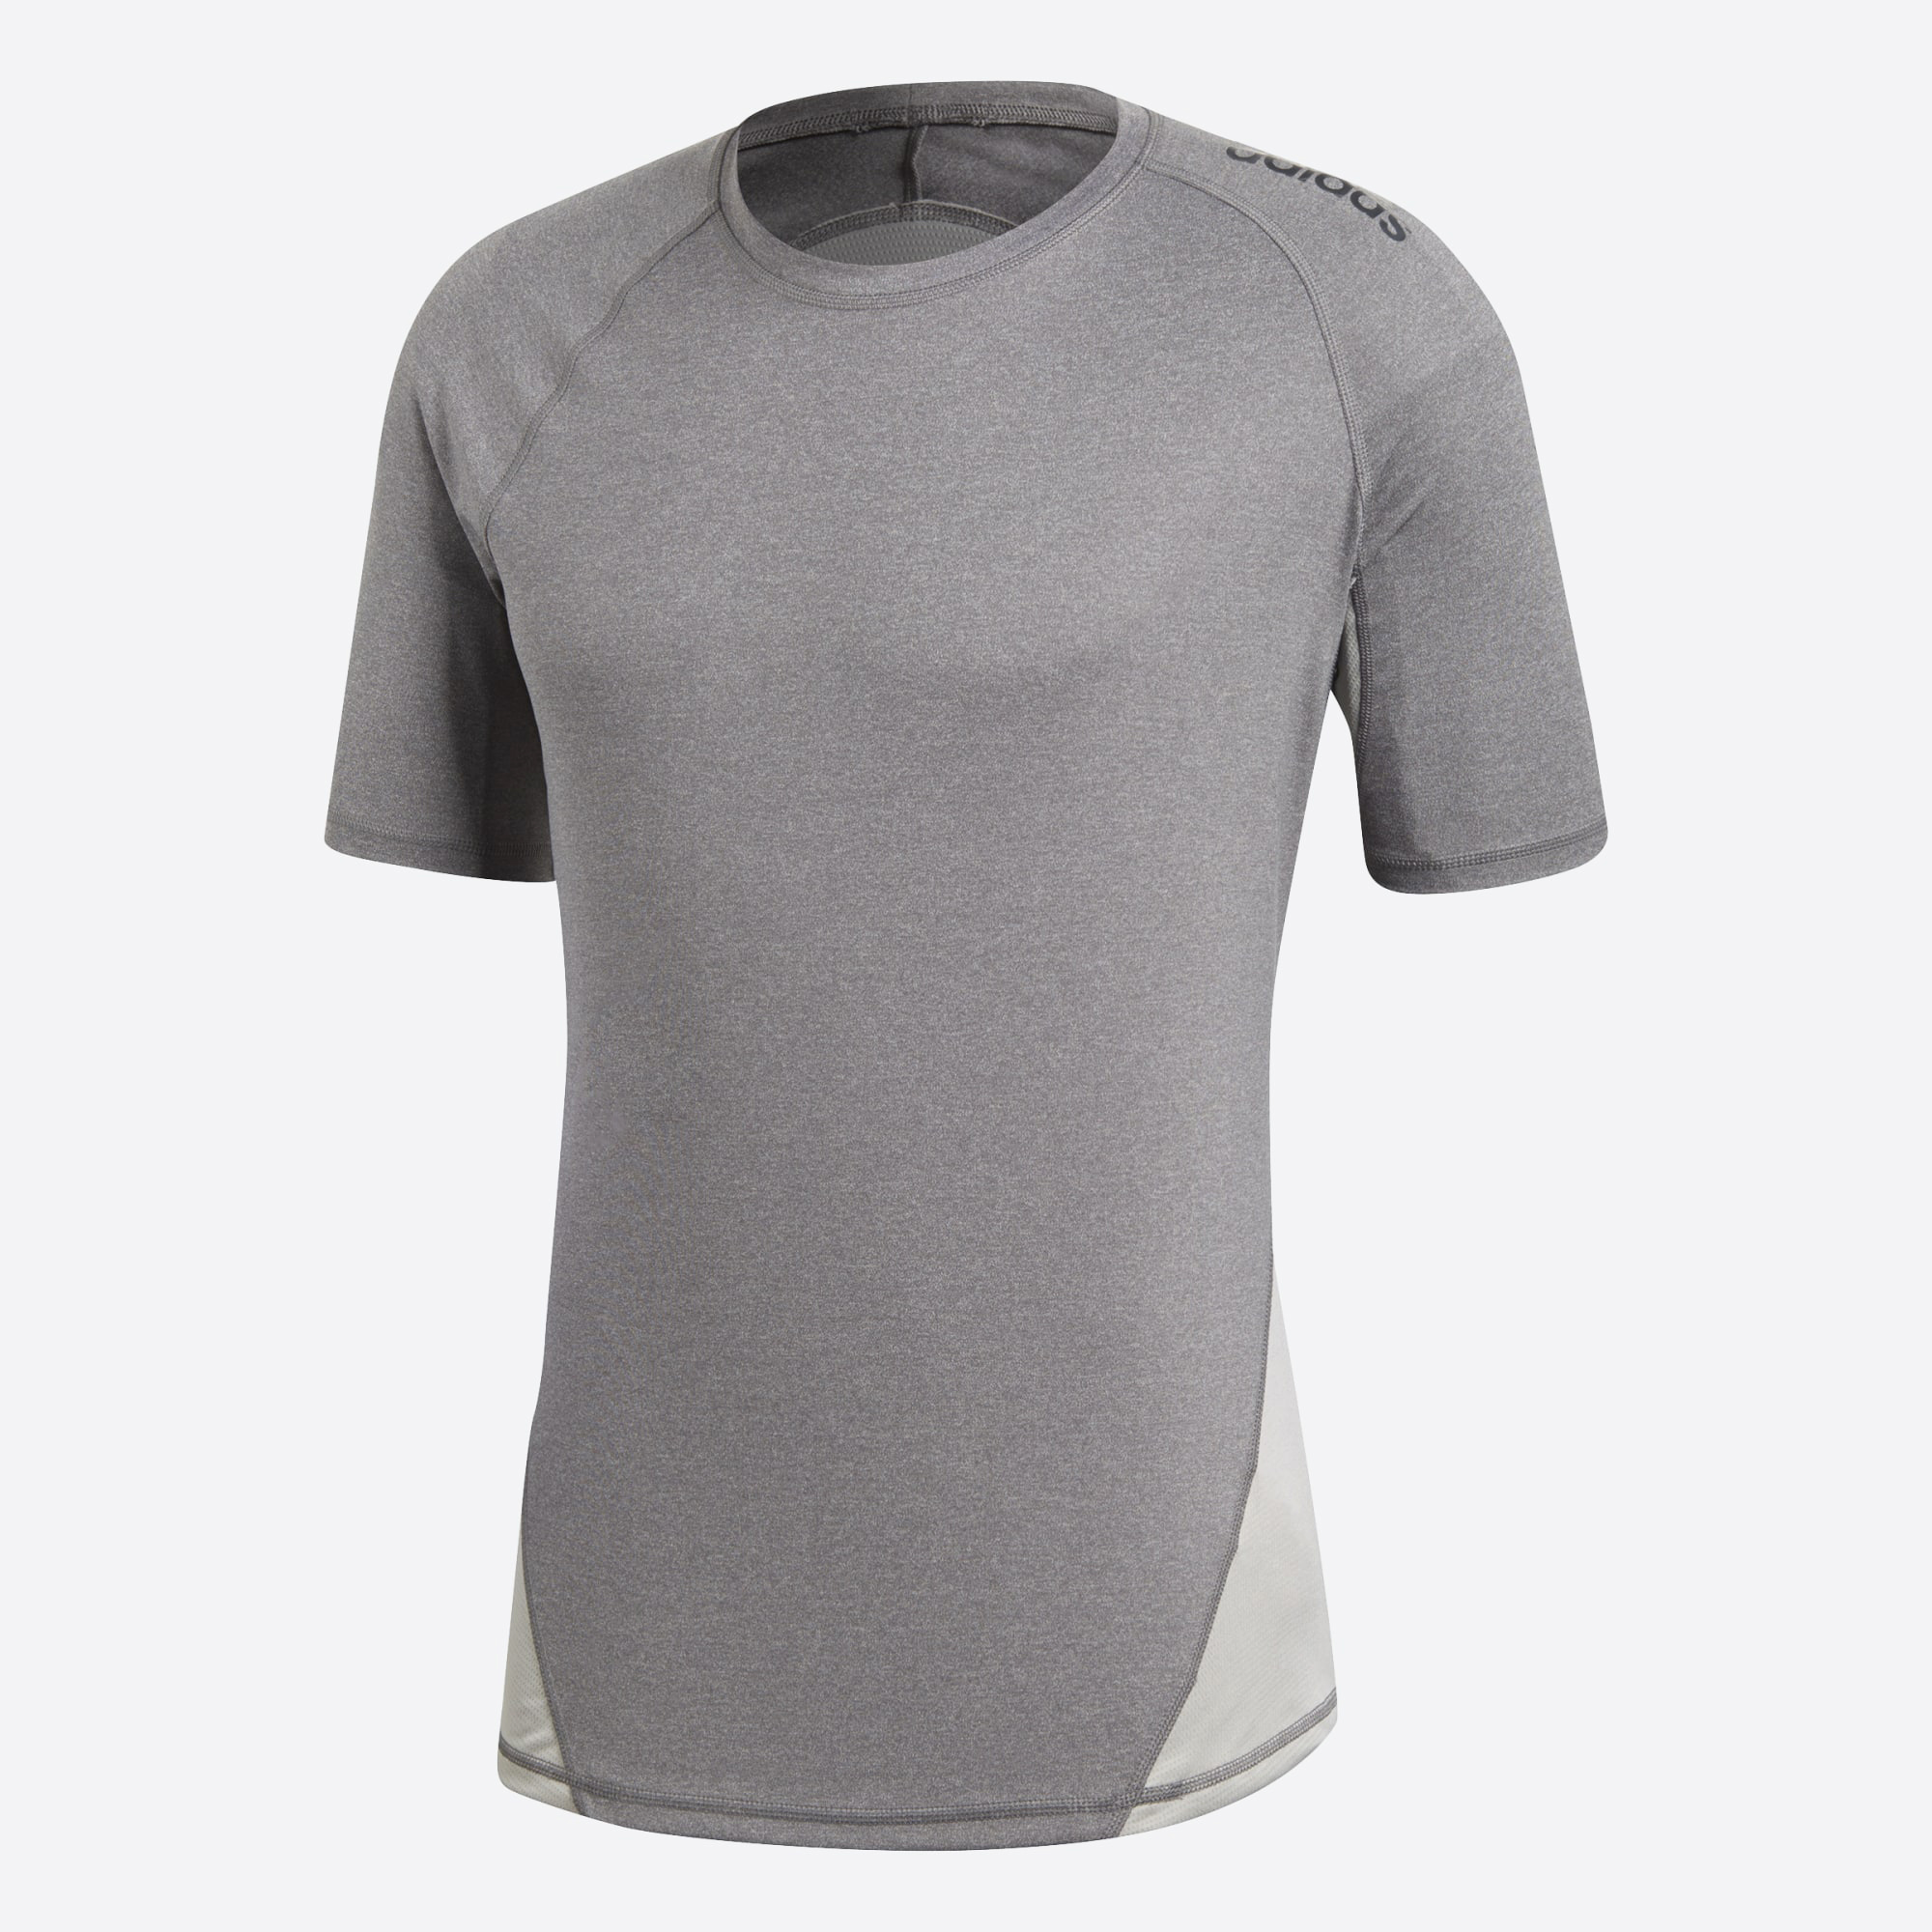 Áo thể thao nam Adidas Training Alphaskin Sport Tee Grey